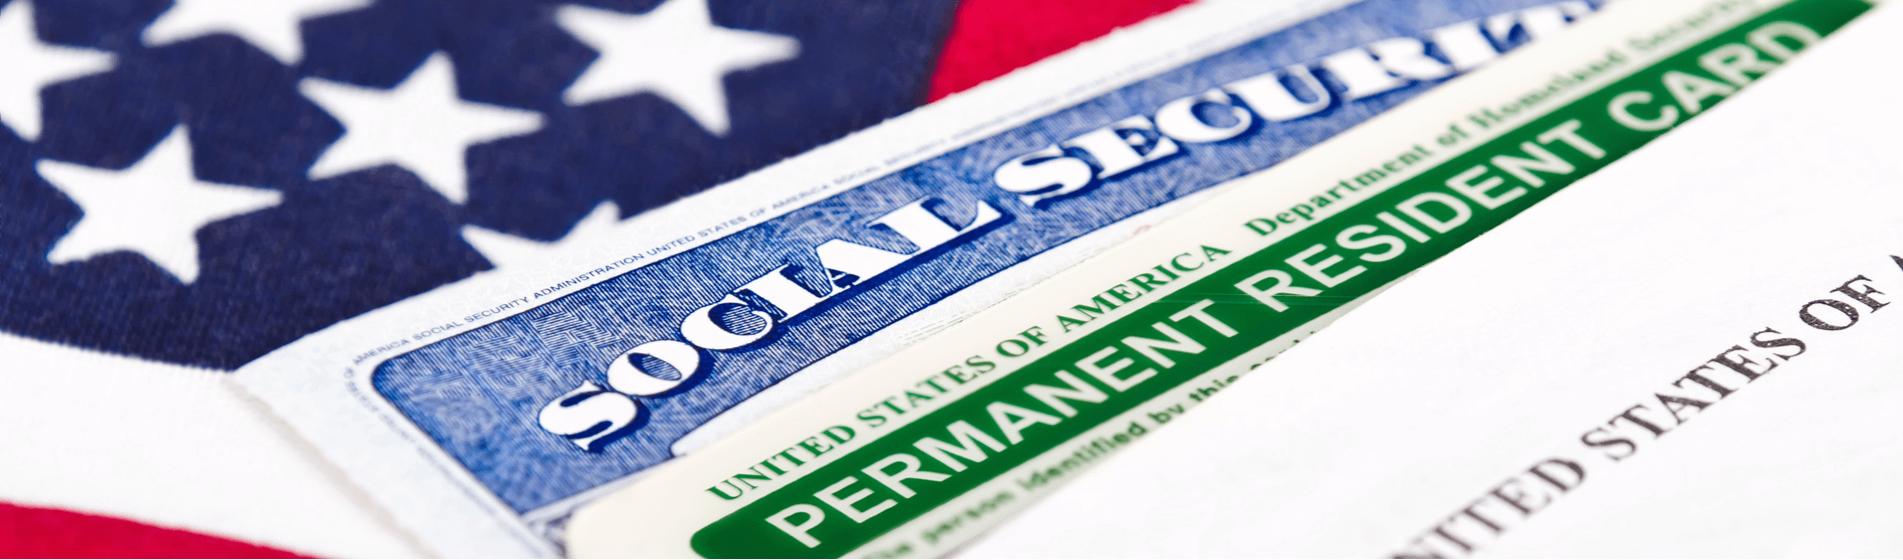 Form I-407 Relinquish US Permanent Residence